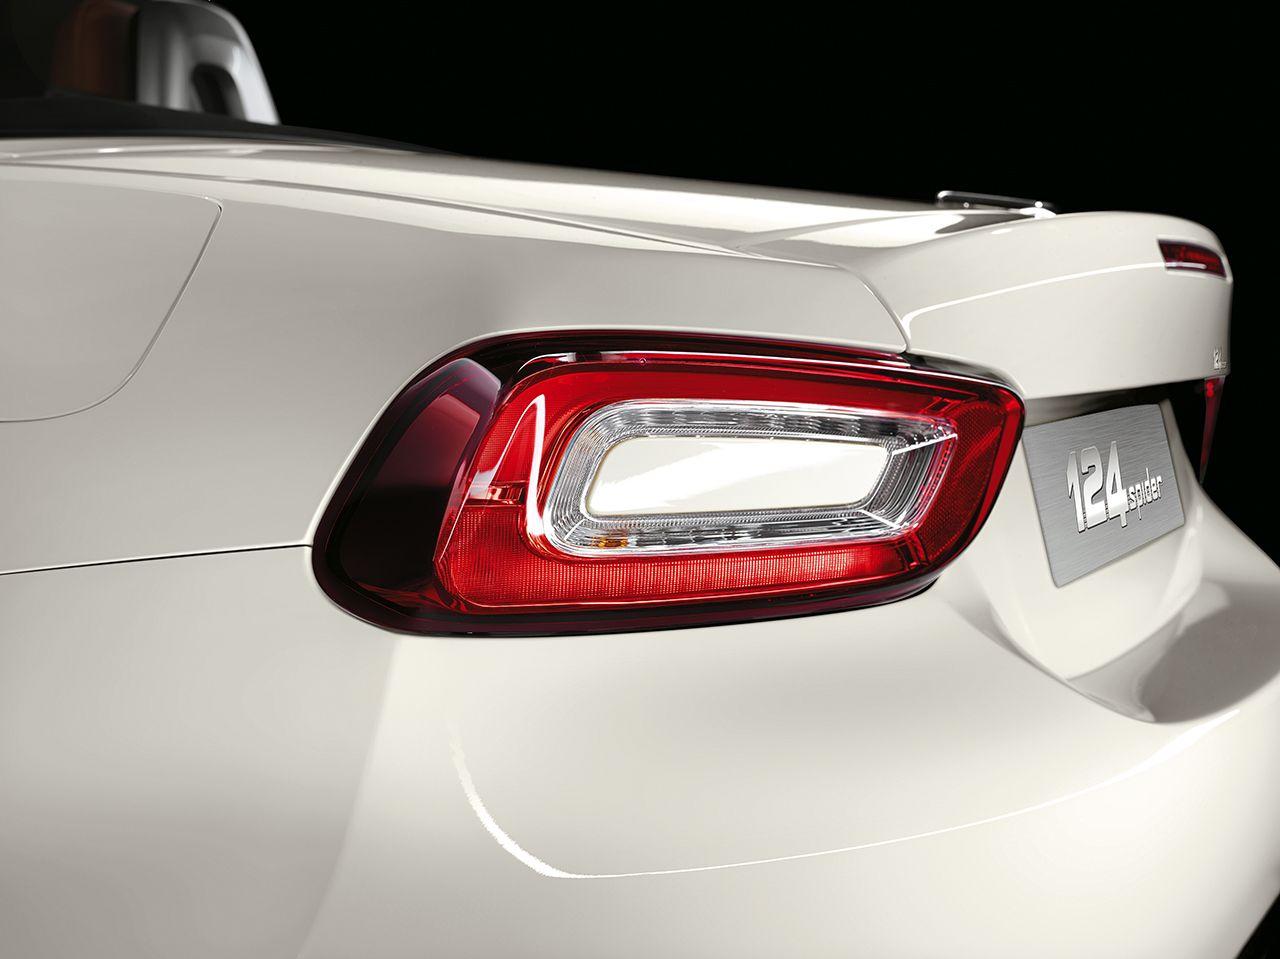 160301 Fiat 124 Spider 13 Άνοιξαν οι παραγγελίες τoυ νέου FIAT 124 Spider στην ελληνική αγορά! cabrio, Fiat, fiat 124 spider, Roadster, αγορά